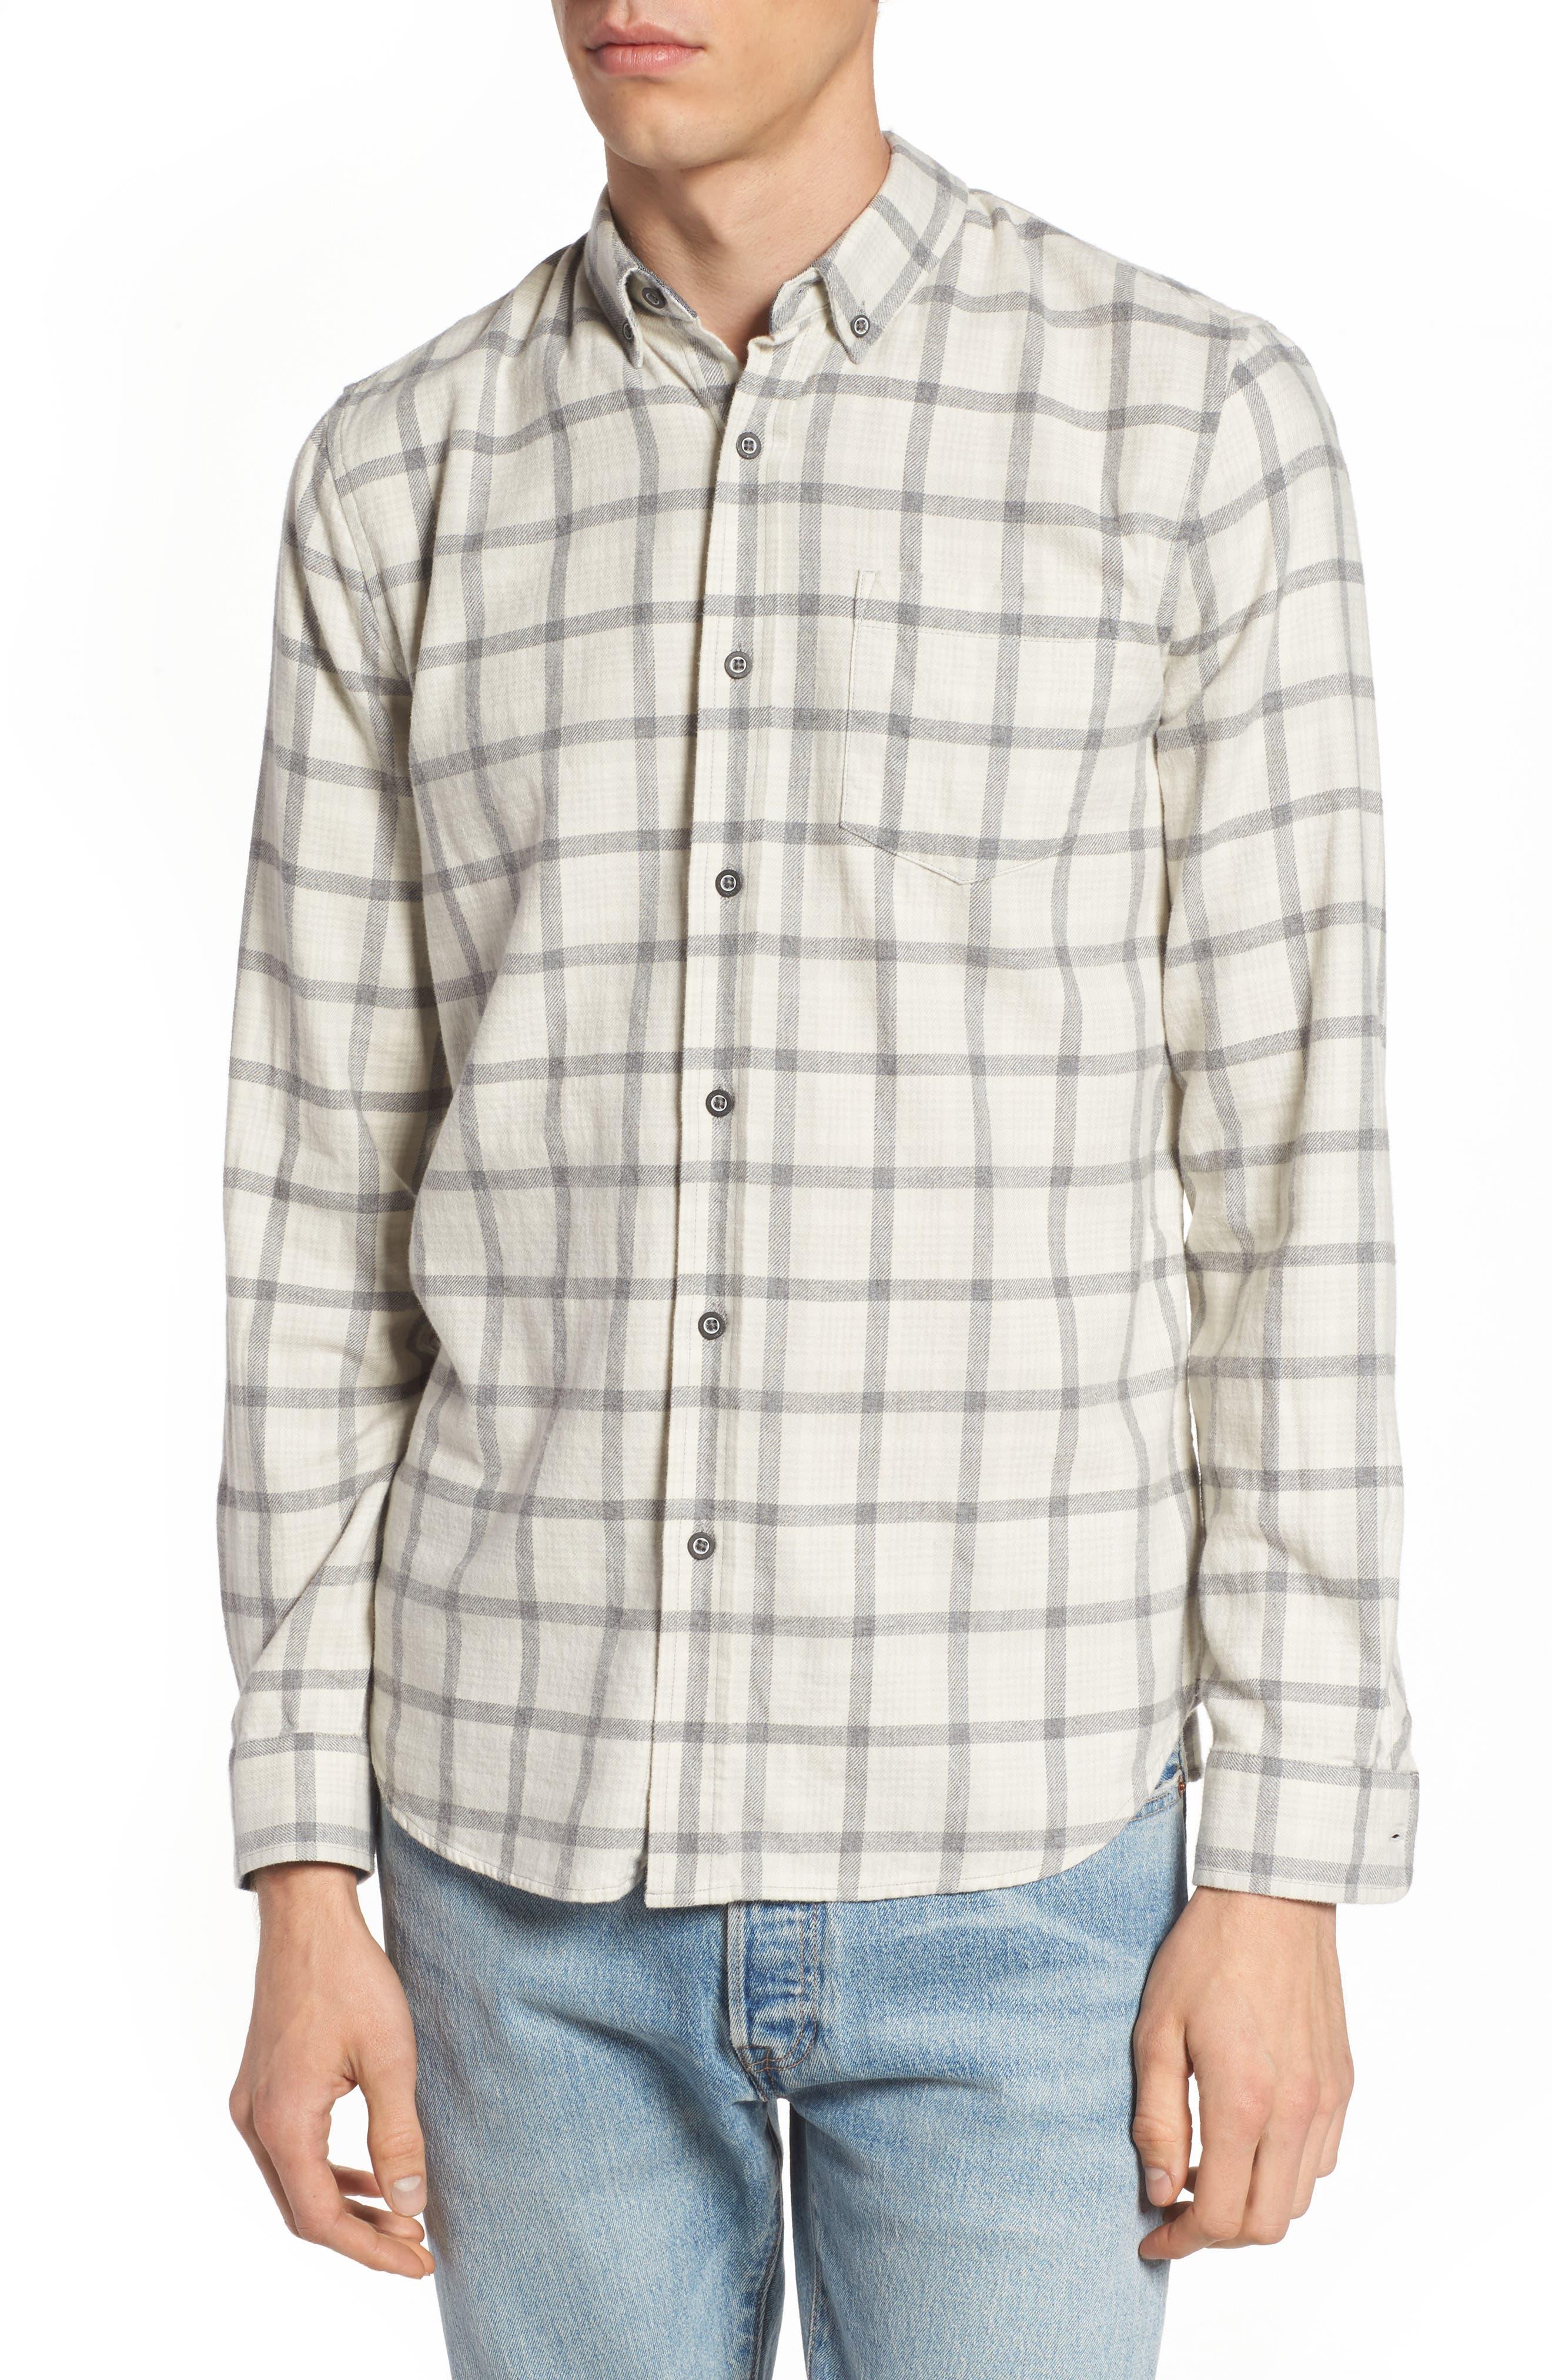 Grady Slim Fit Plaid Sport Shirt,                             Main thumbnail 1, color,                             Moon Glade/ Heather Grey